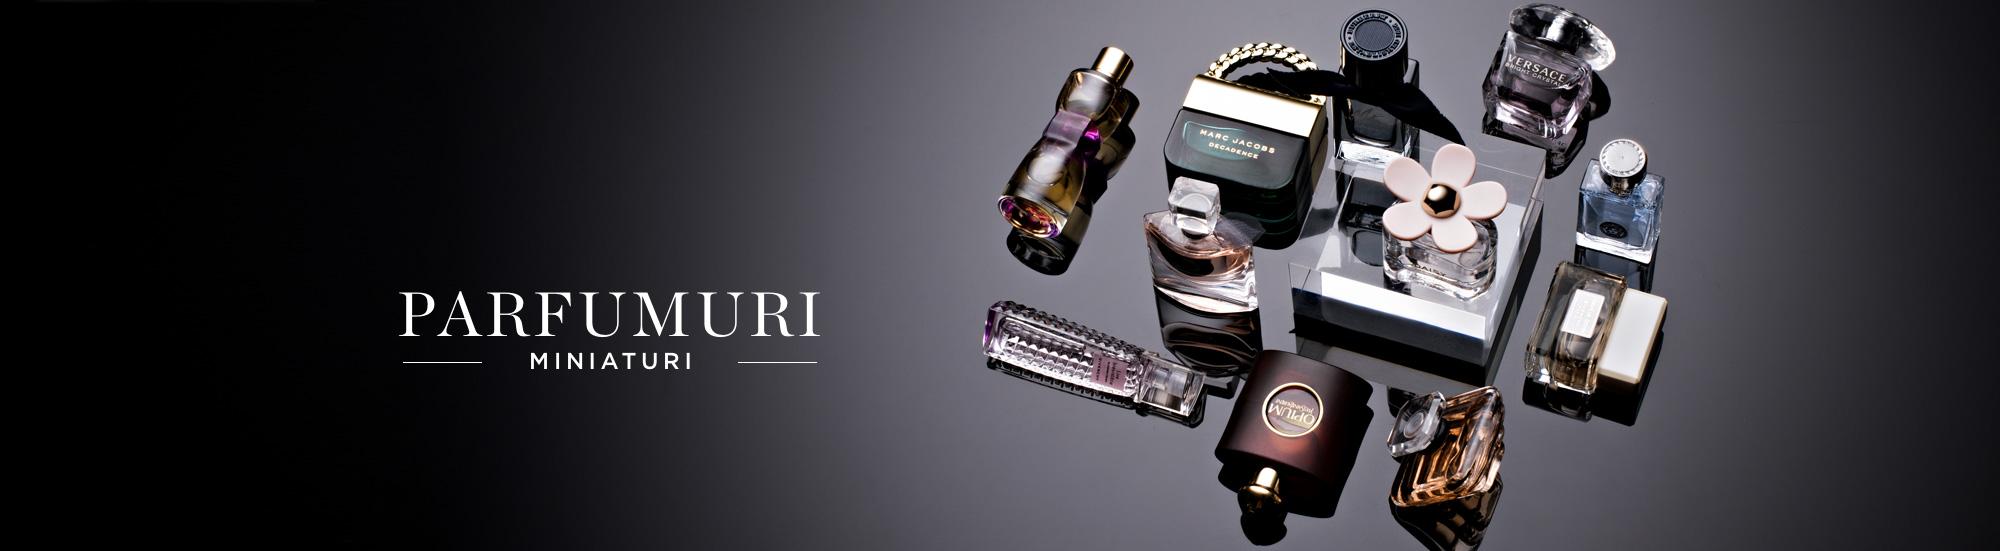 Parfumuri Seturi Miniaturi Bestvalue Duty Free Experience